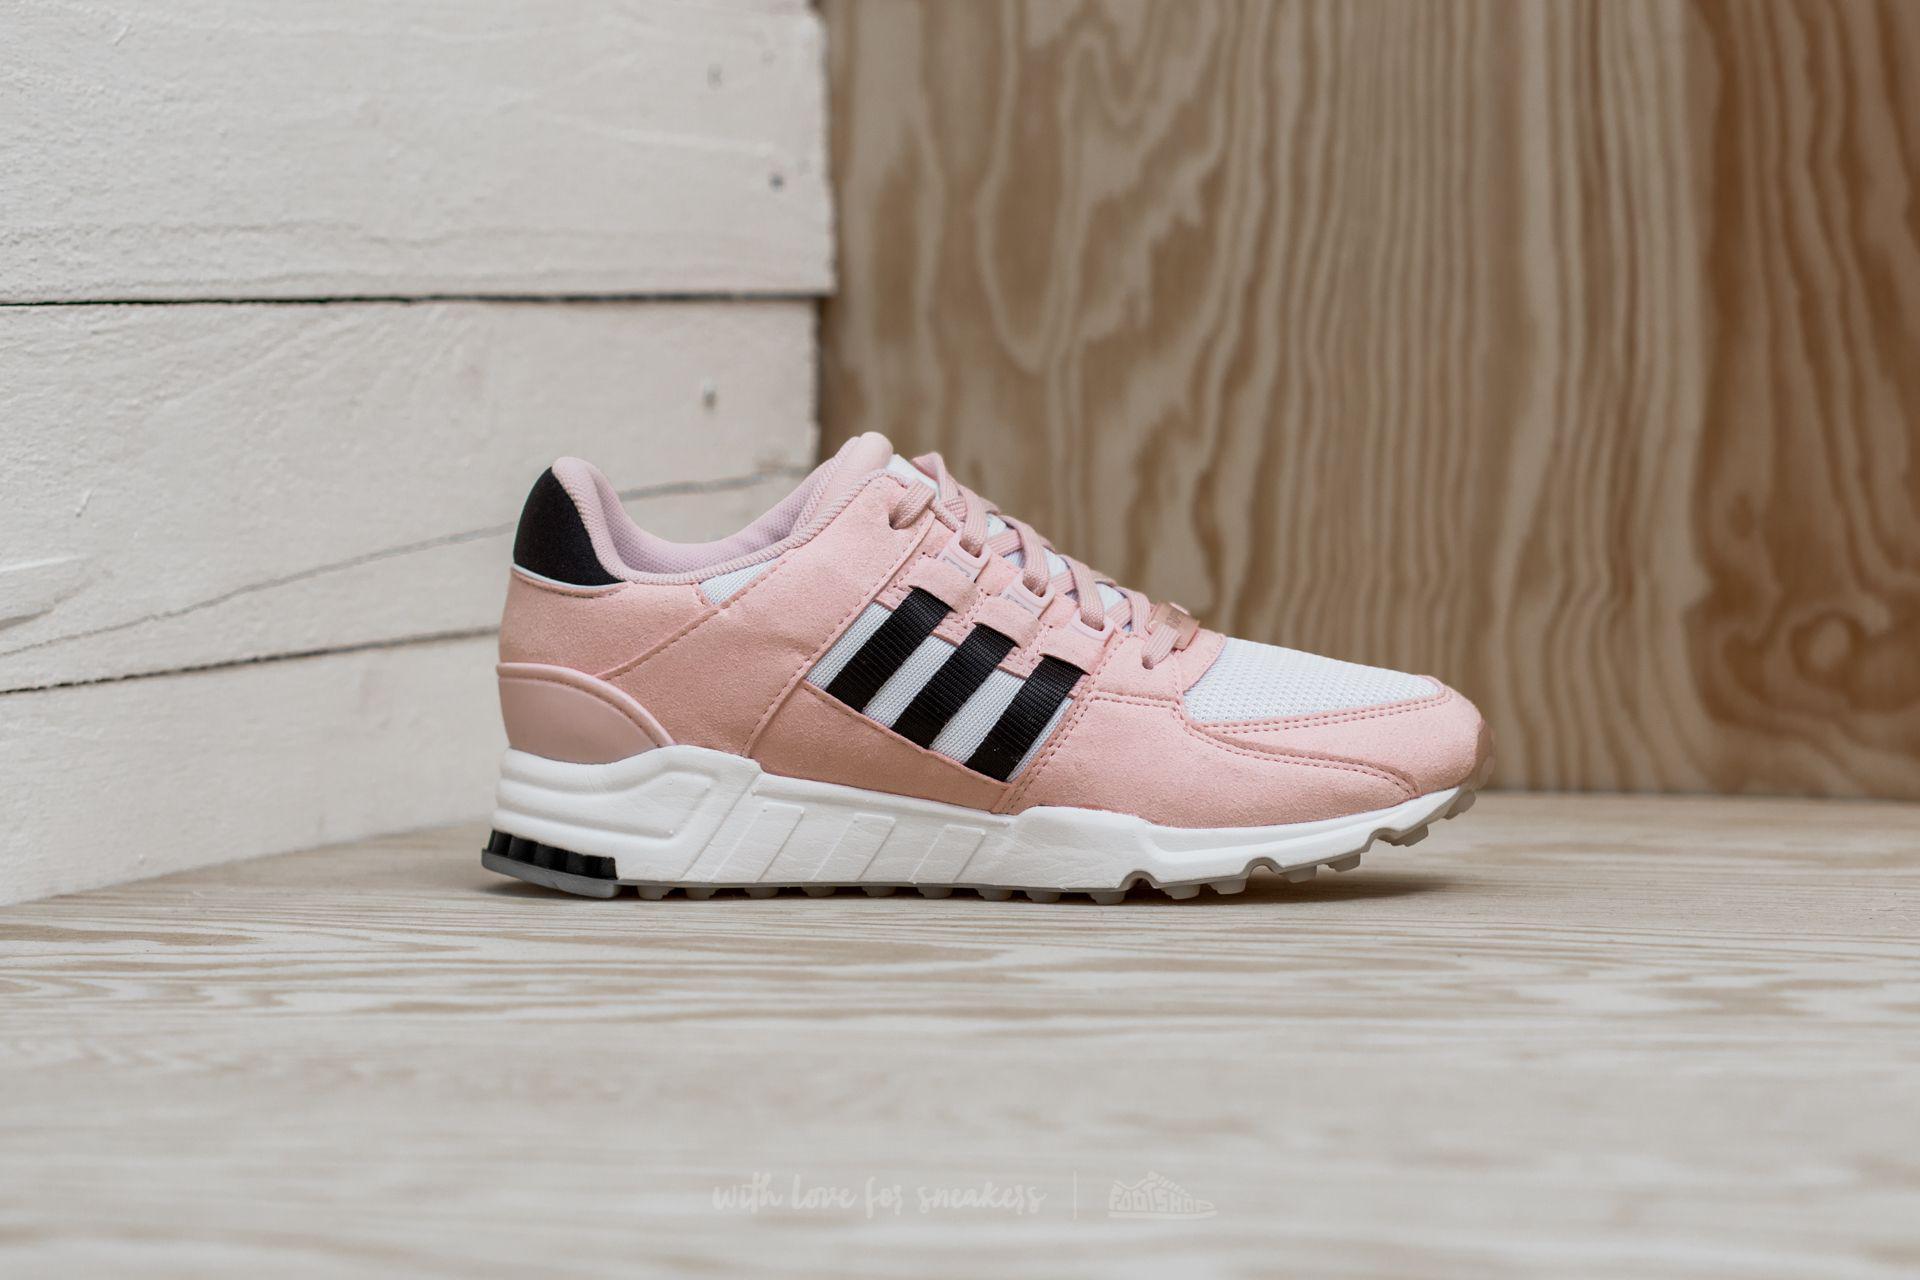 686f01097d14 Lyst - adidas Originals Adidas Eqt Support Rf W Icey Pink  Core ...